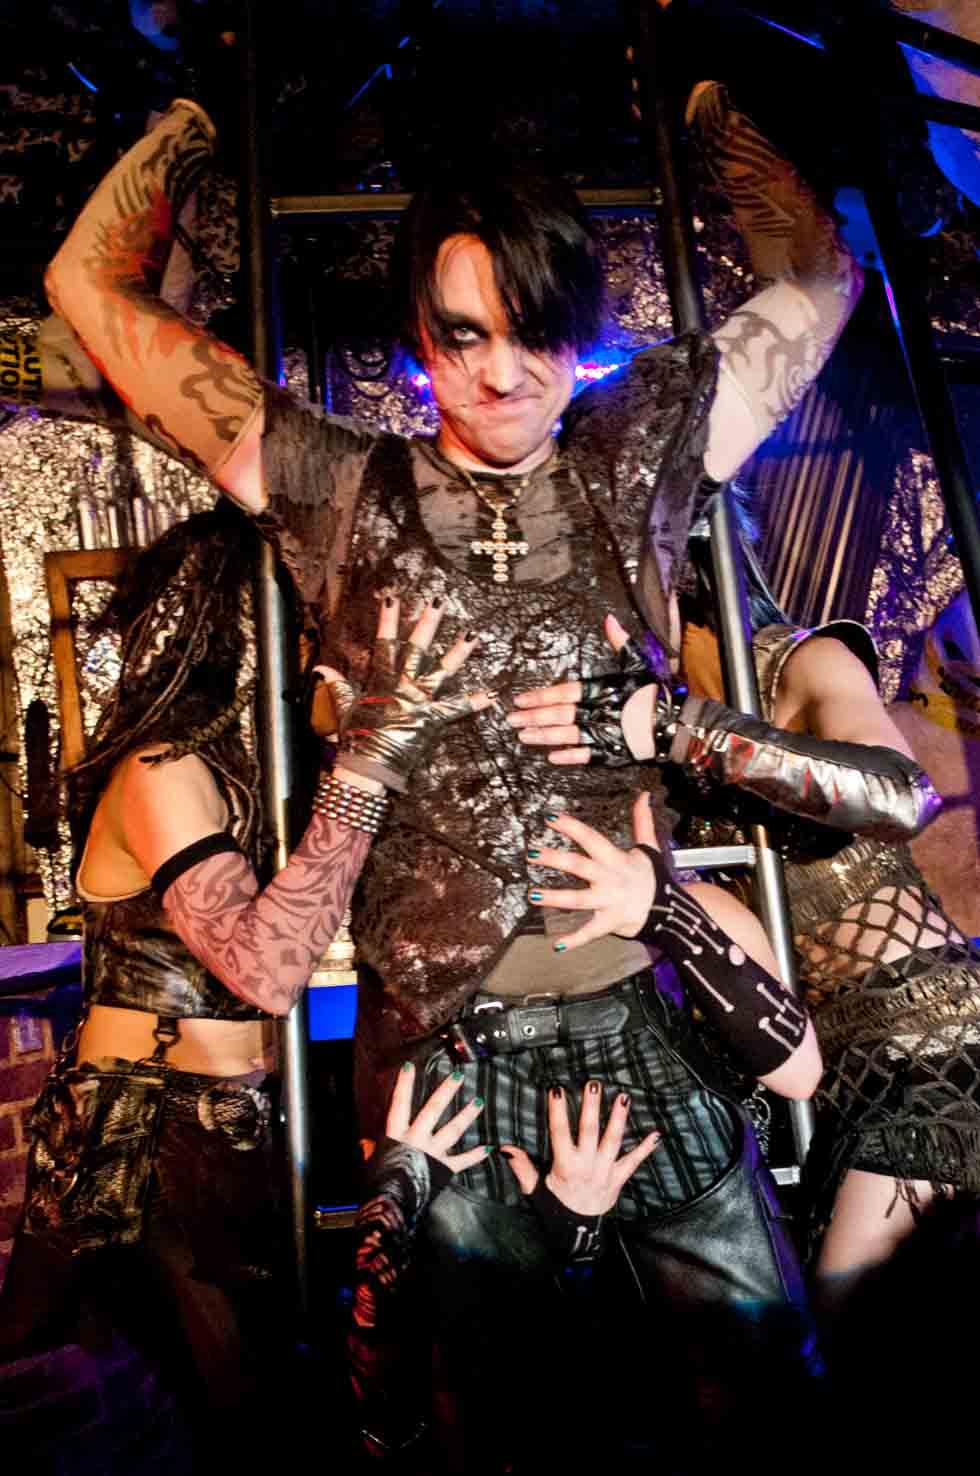 zum-schneider-nyc-2012-karneval-apocalyptika-4129.jpg